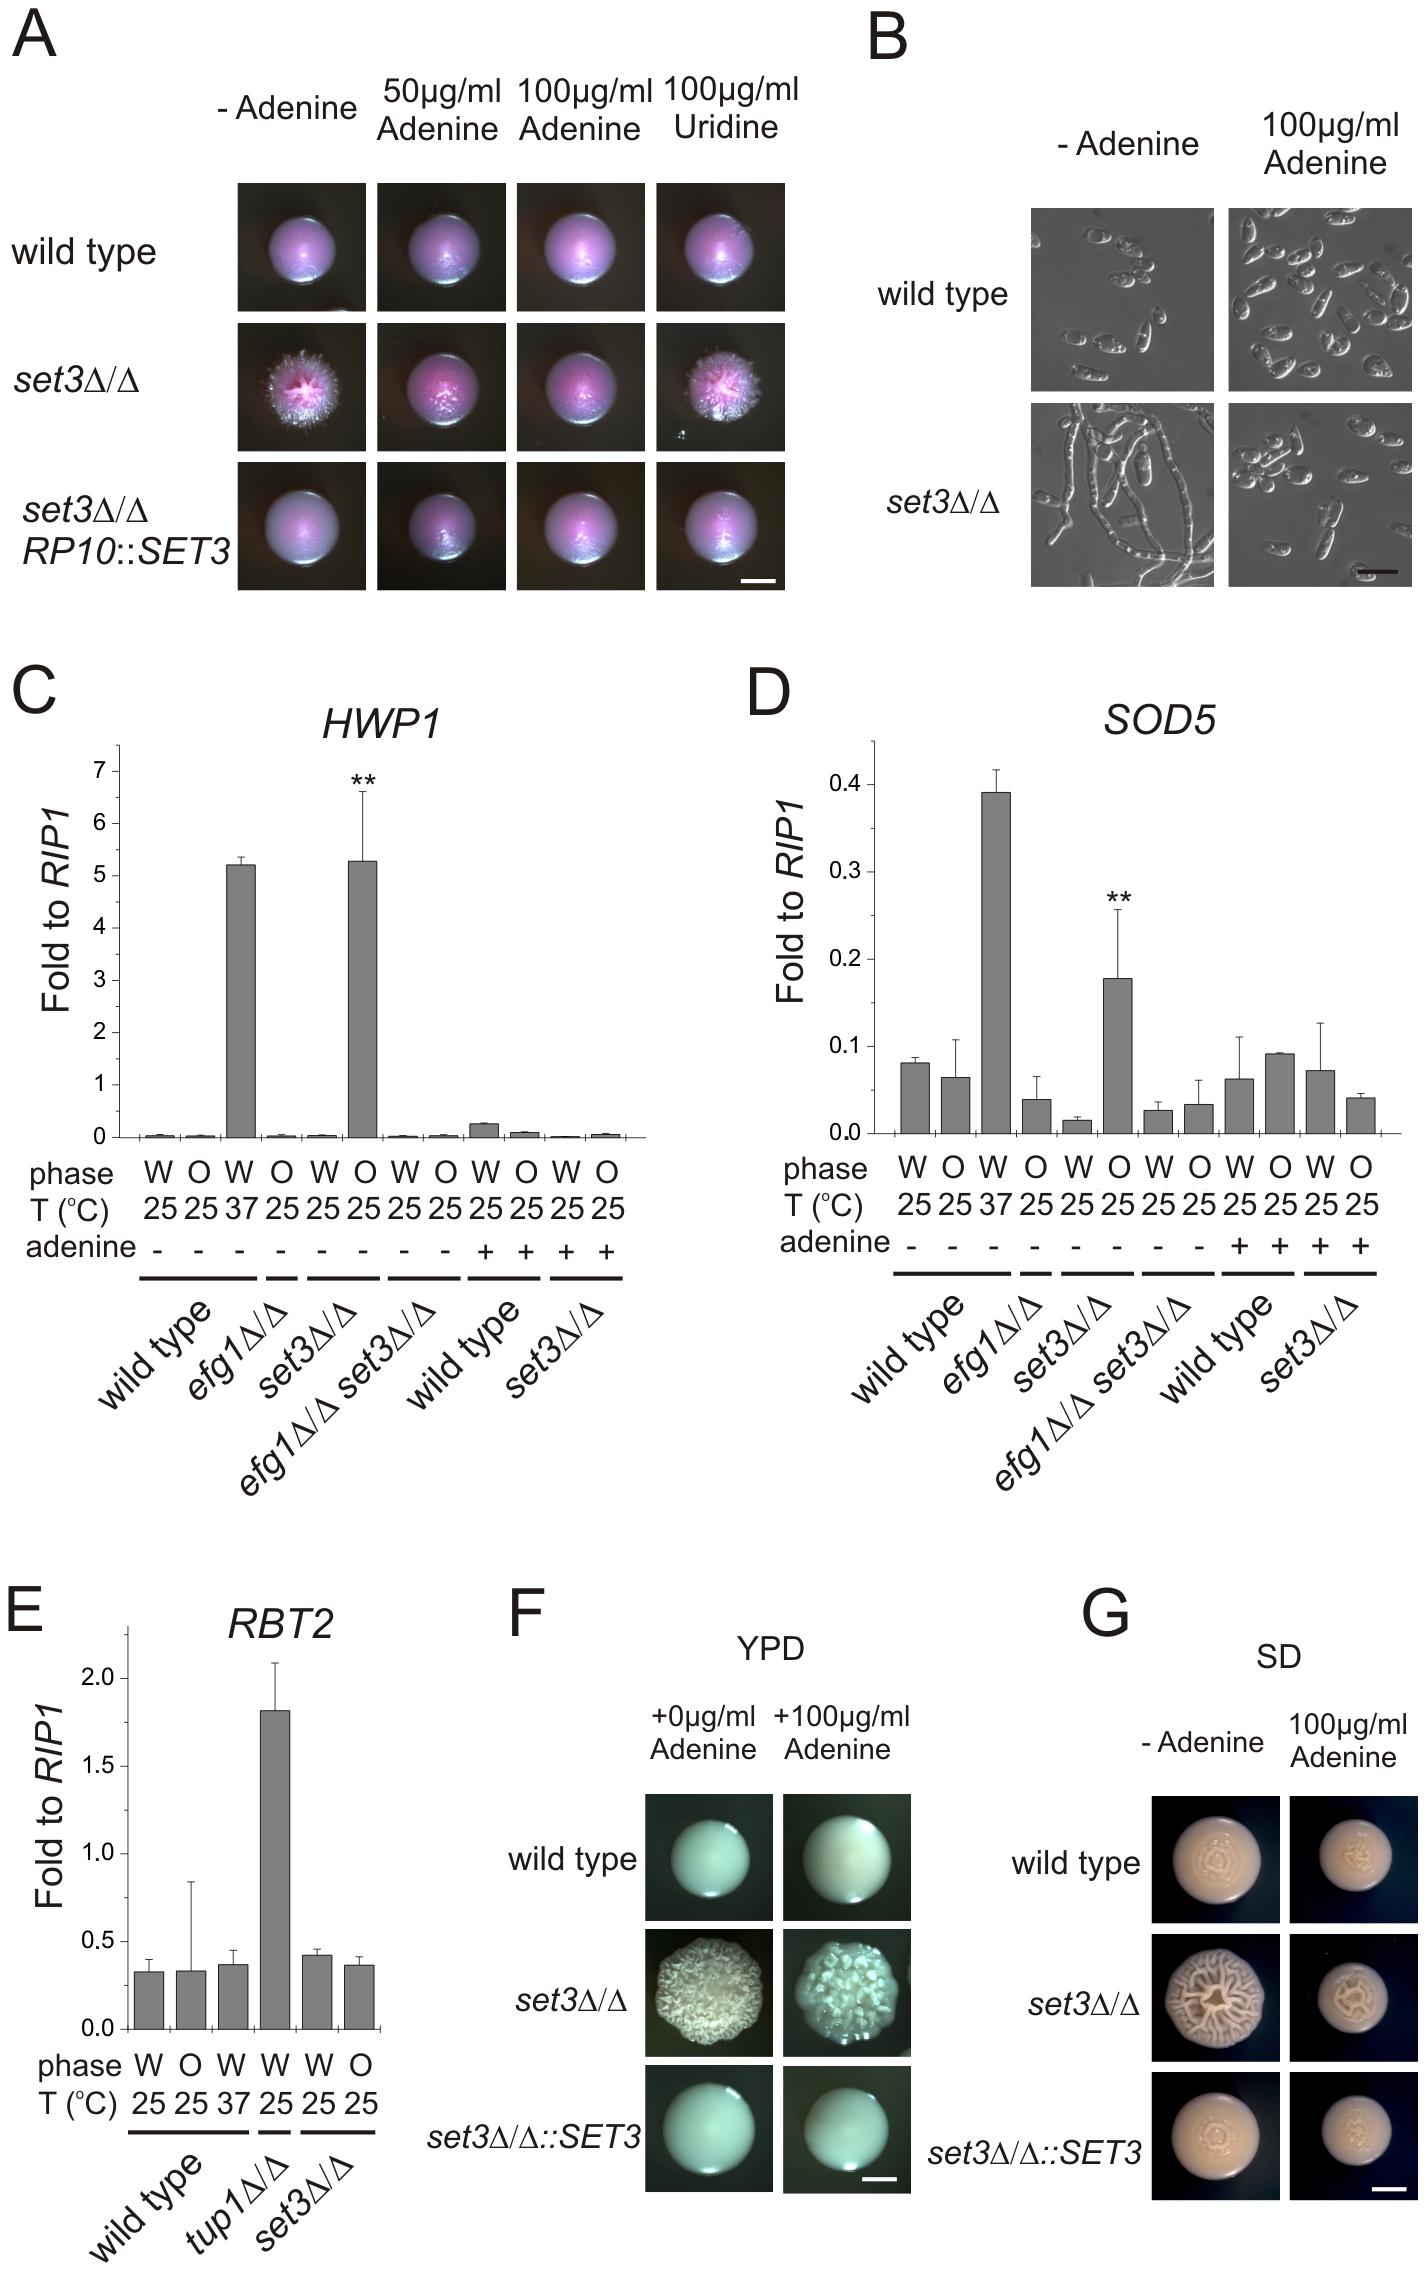 Adenine supplementation suppresses hyperfilamentation of <i>set3</i>Δ/Δ mutants.